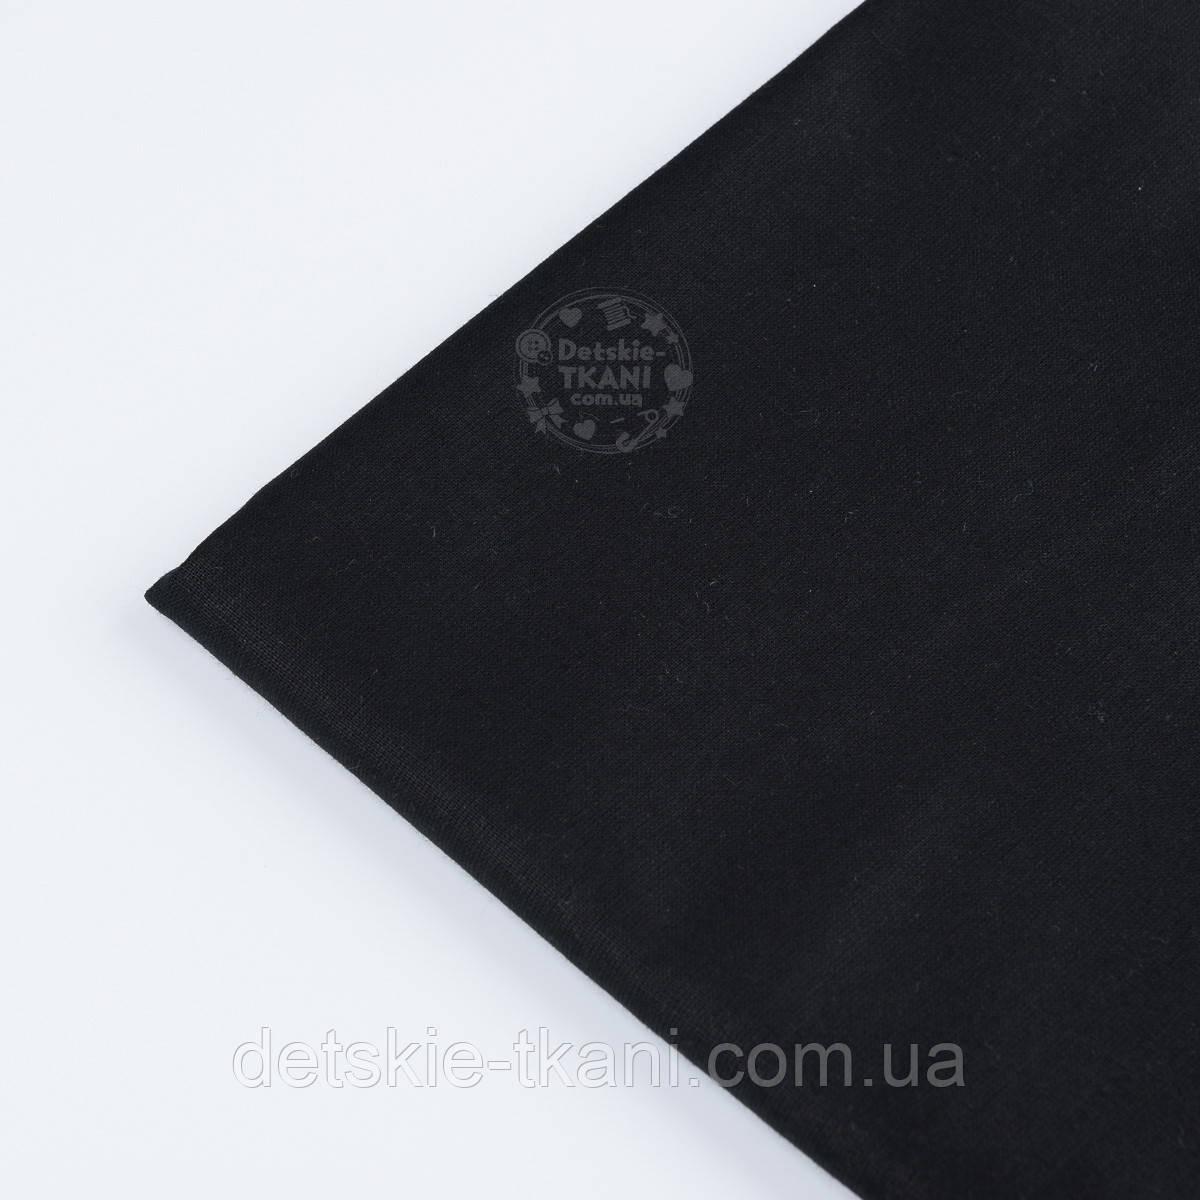 Отрез ткани №587  однотонная чёрного цвета, 87*160